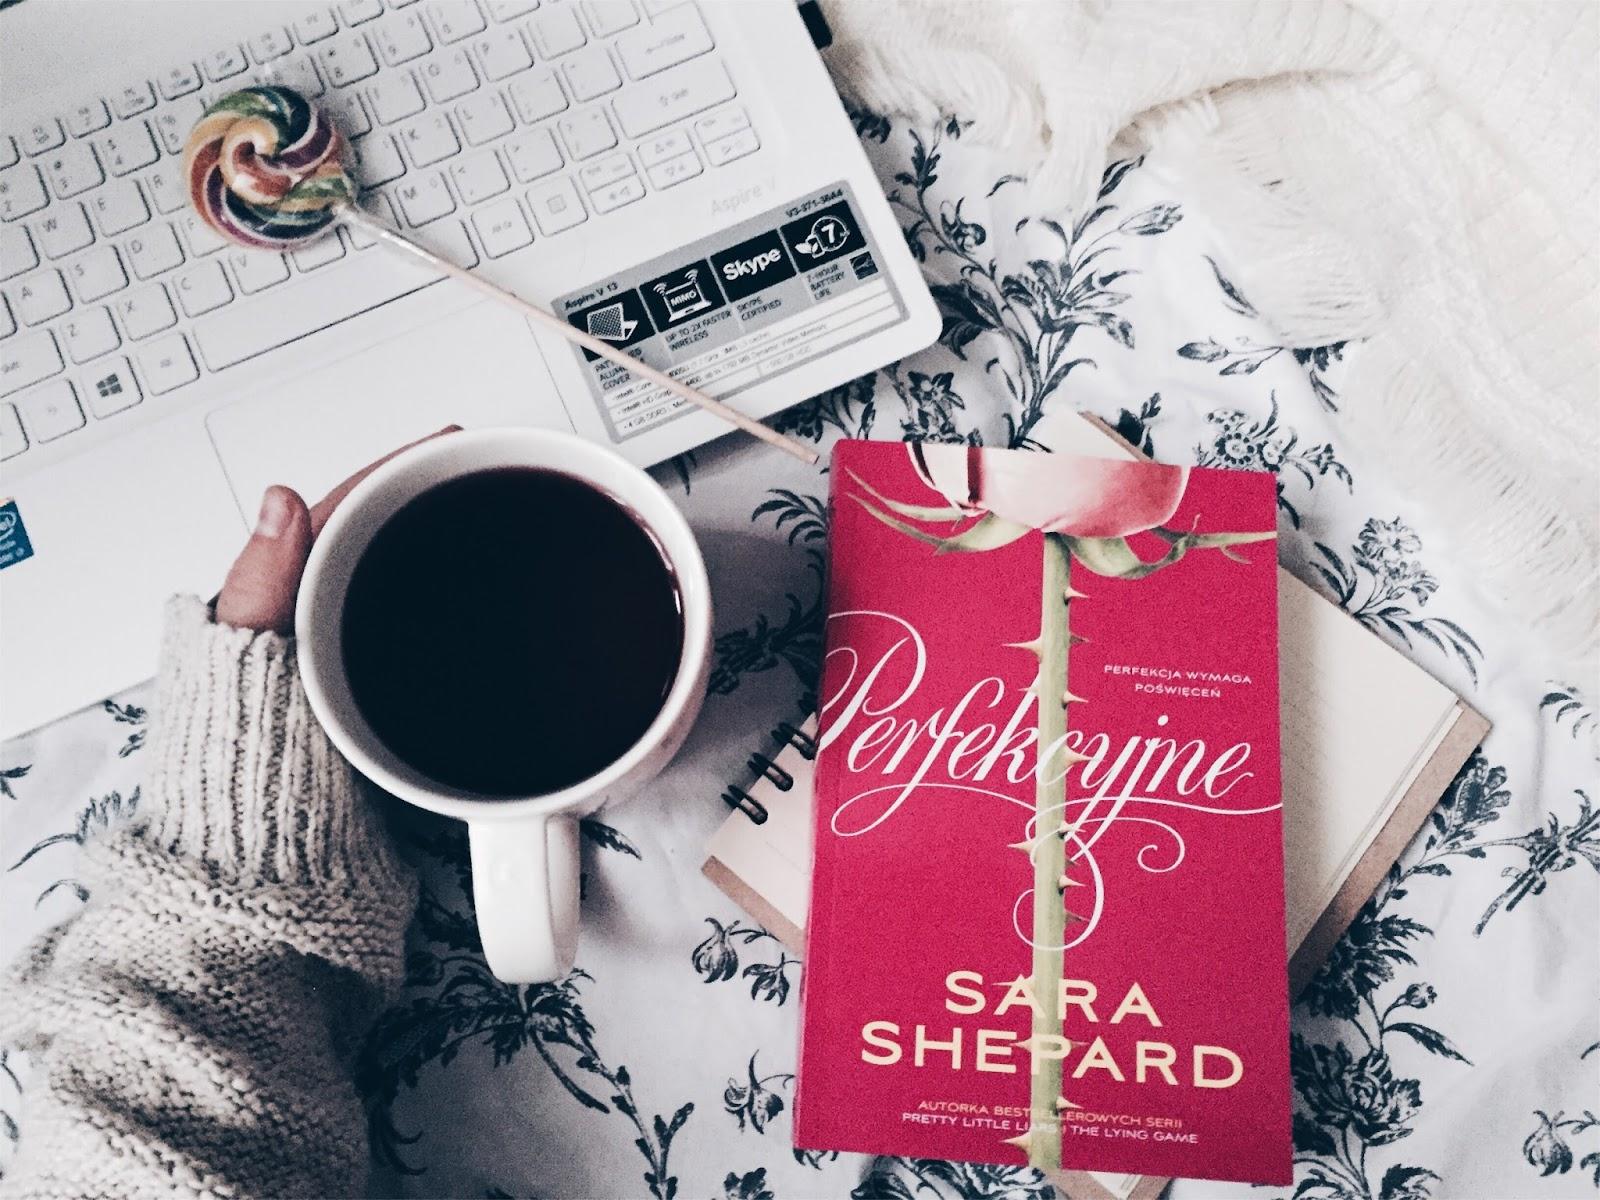 Perfekcyjne, Sara Shepard